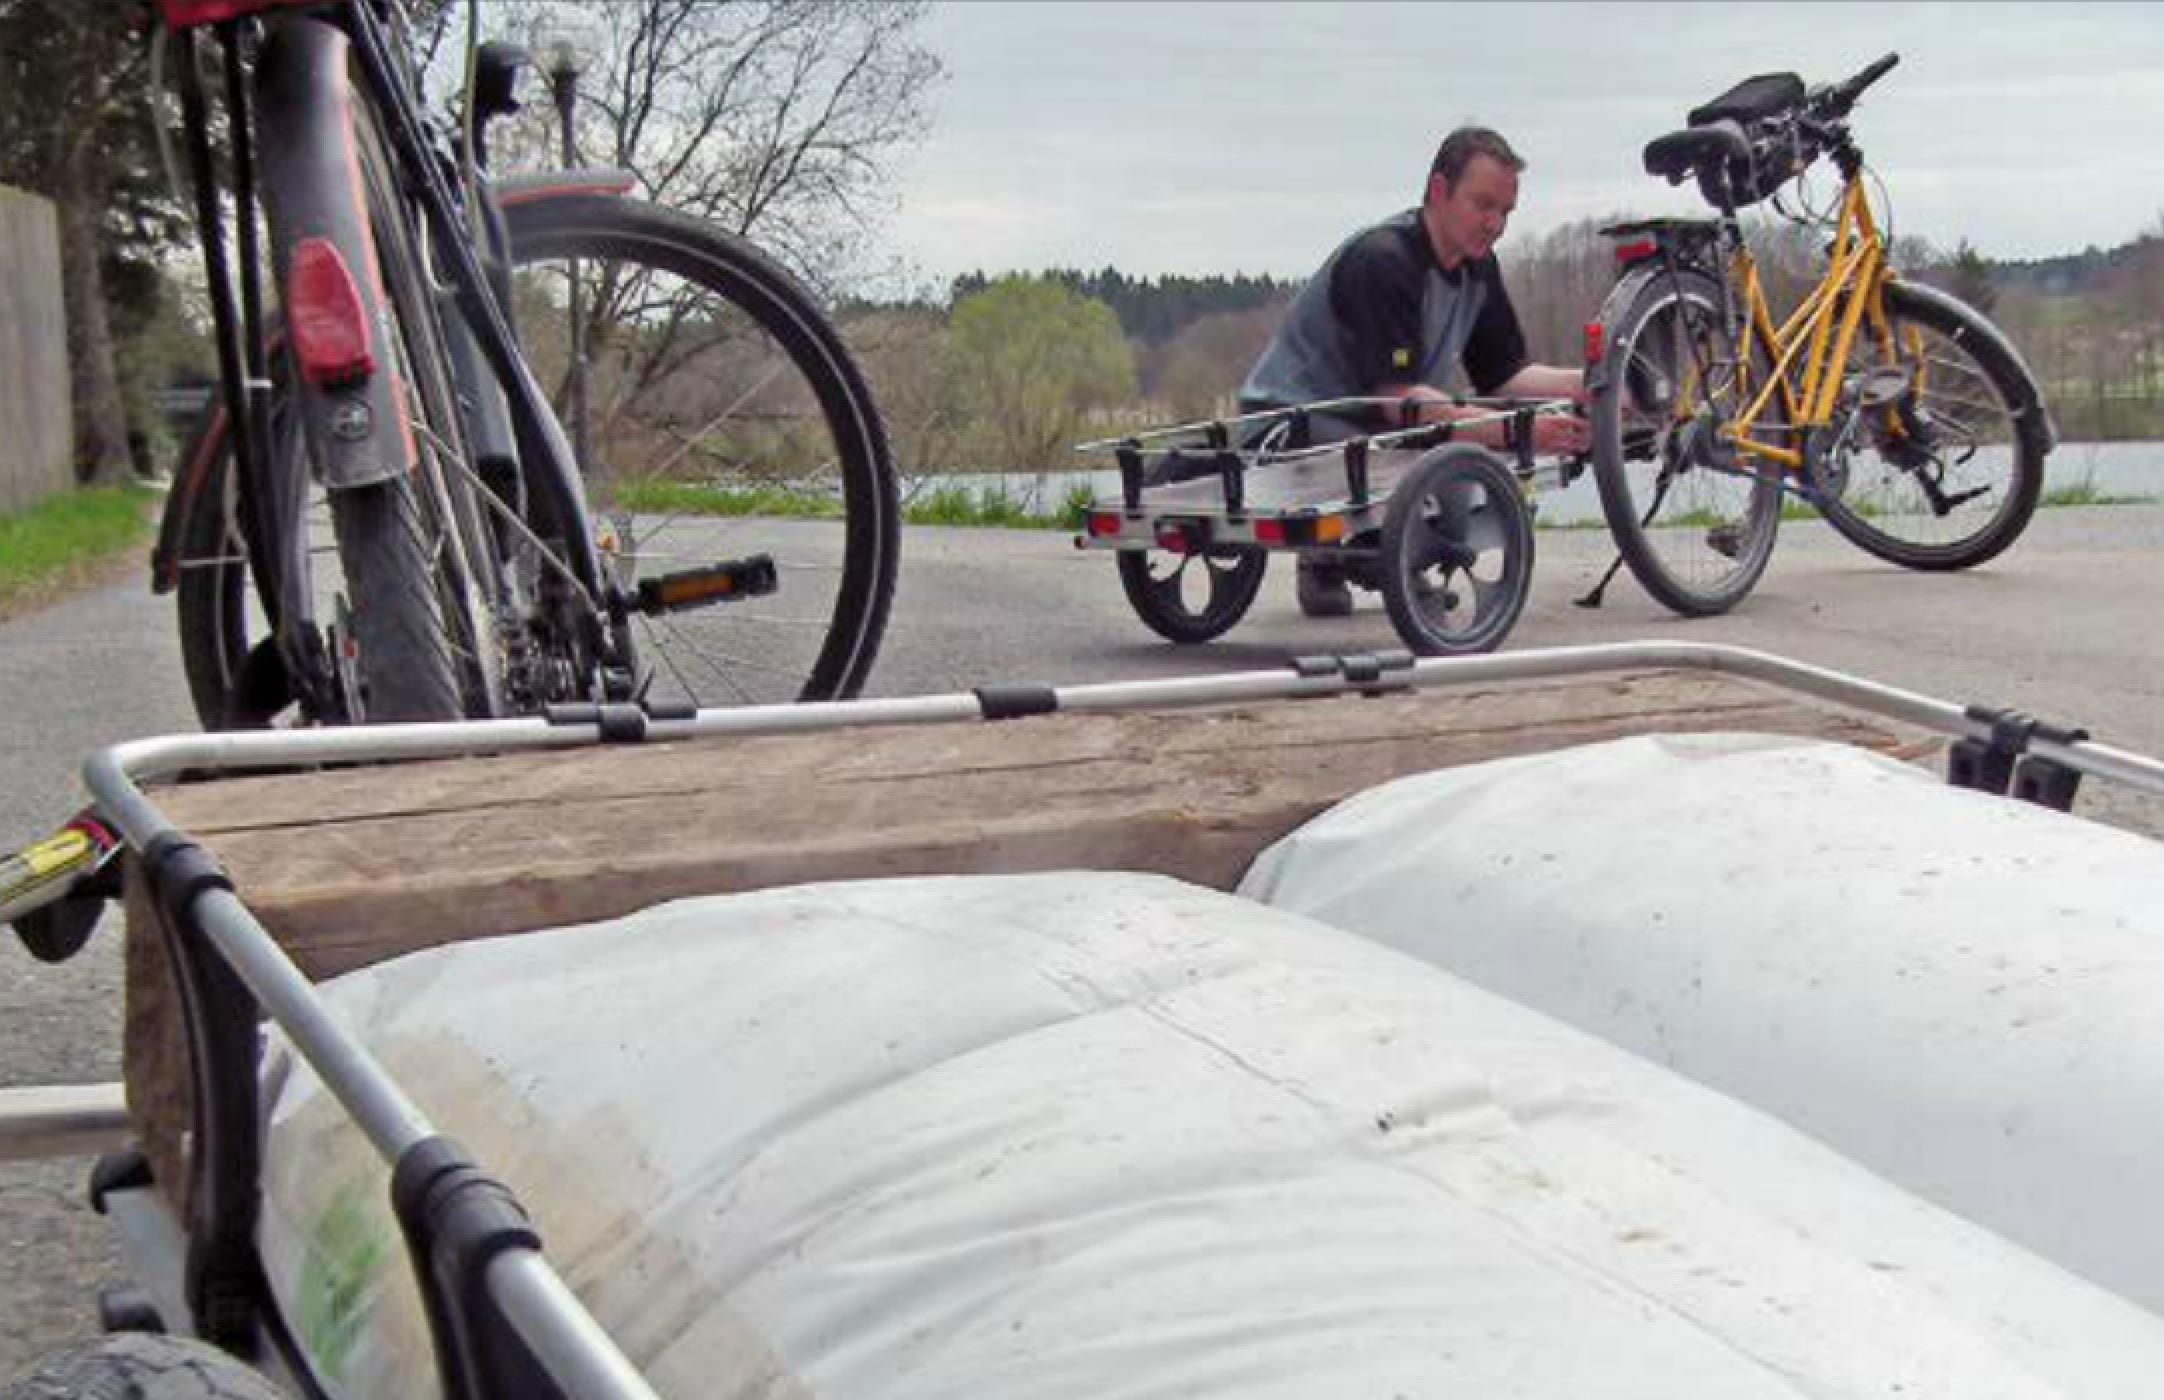 Rückblick: Anhänger zum Transport – der ExtraEnergy Test 2012